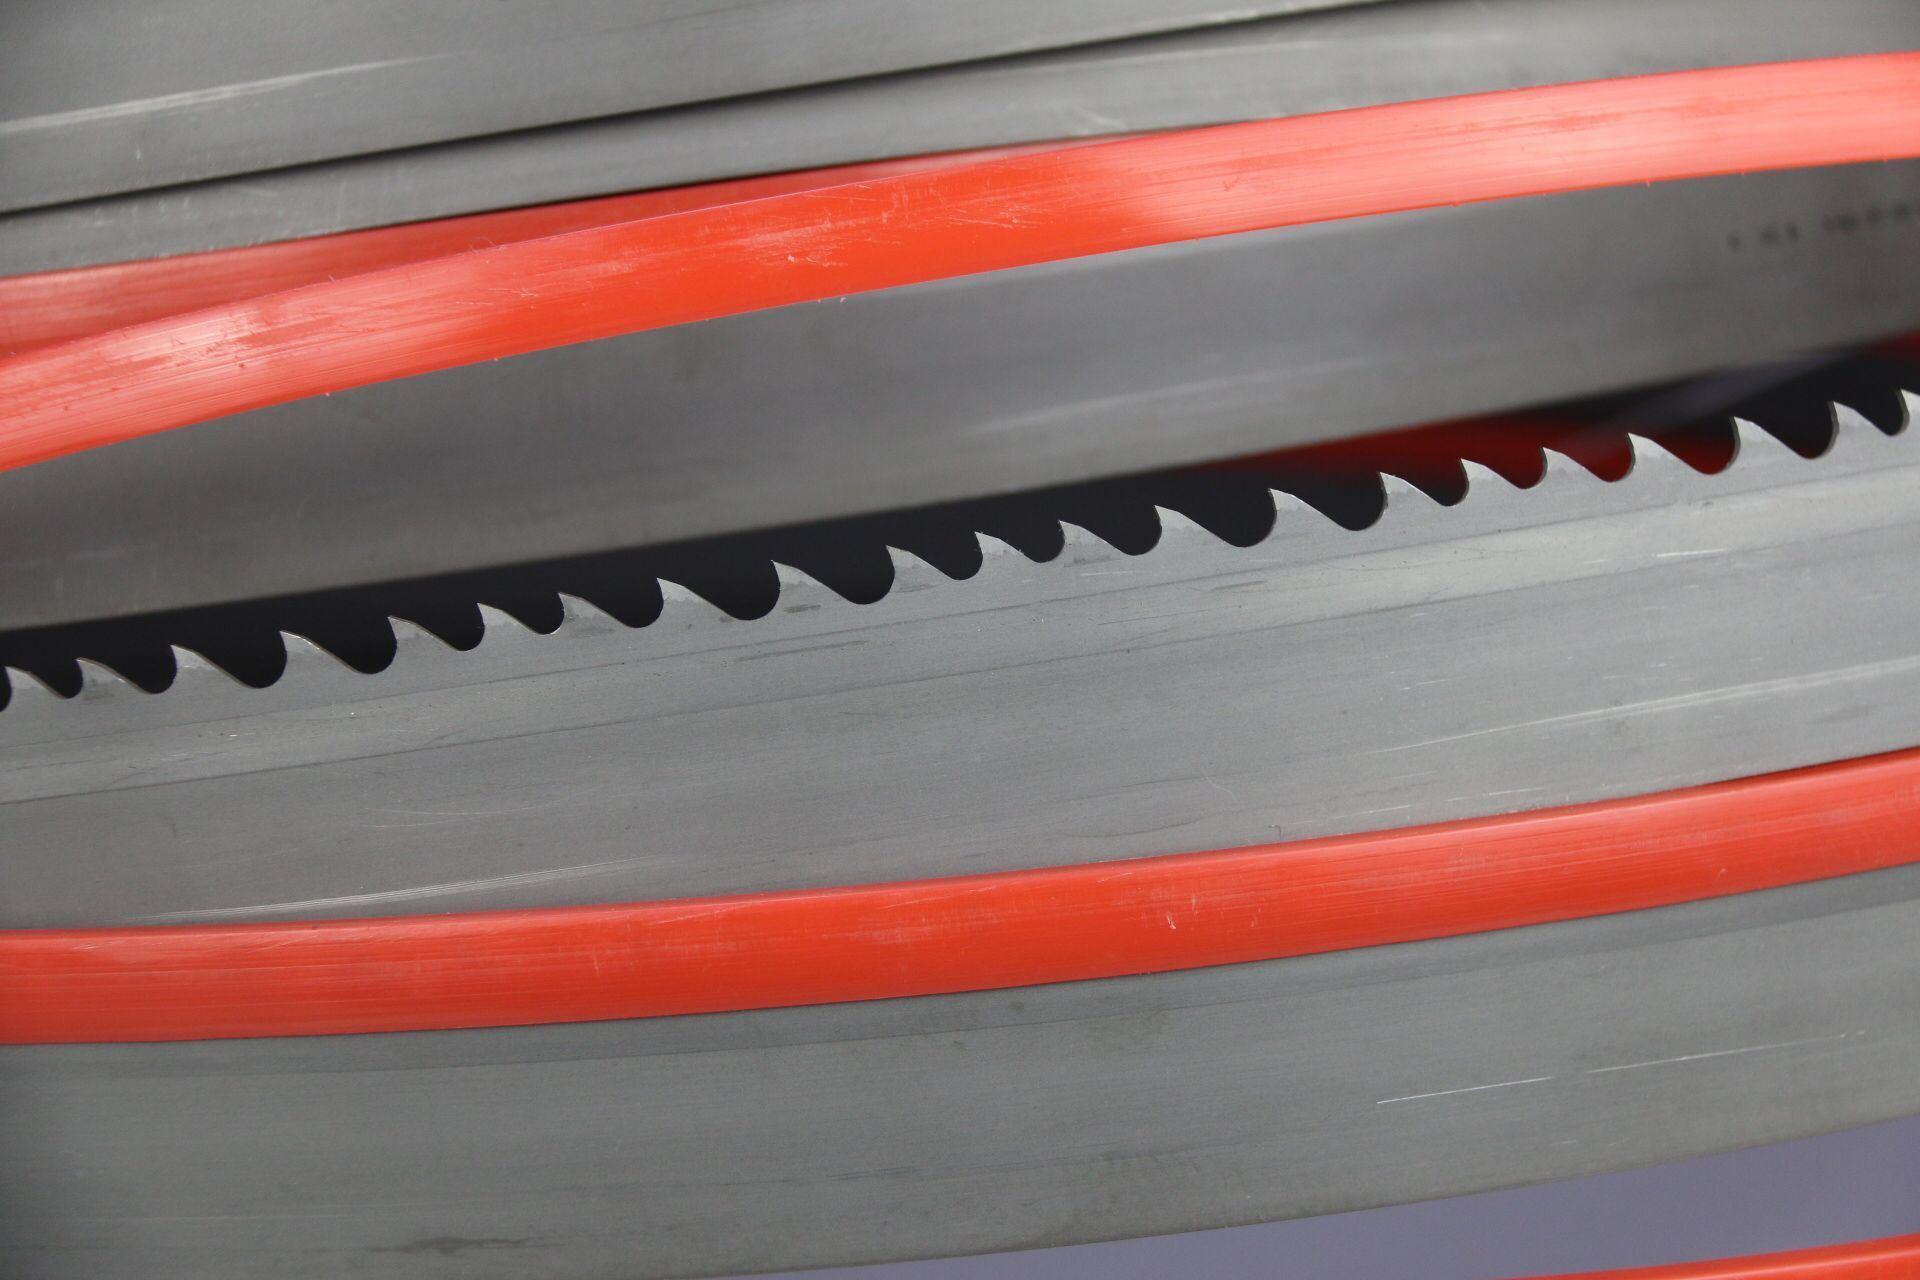 M42 Compround Band Saw Blades